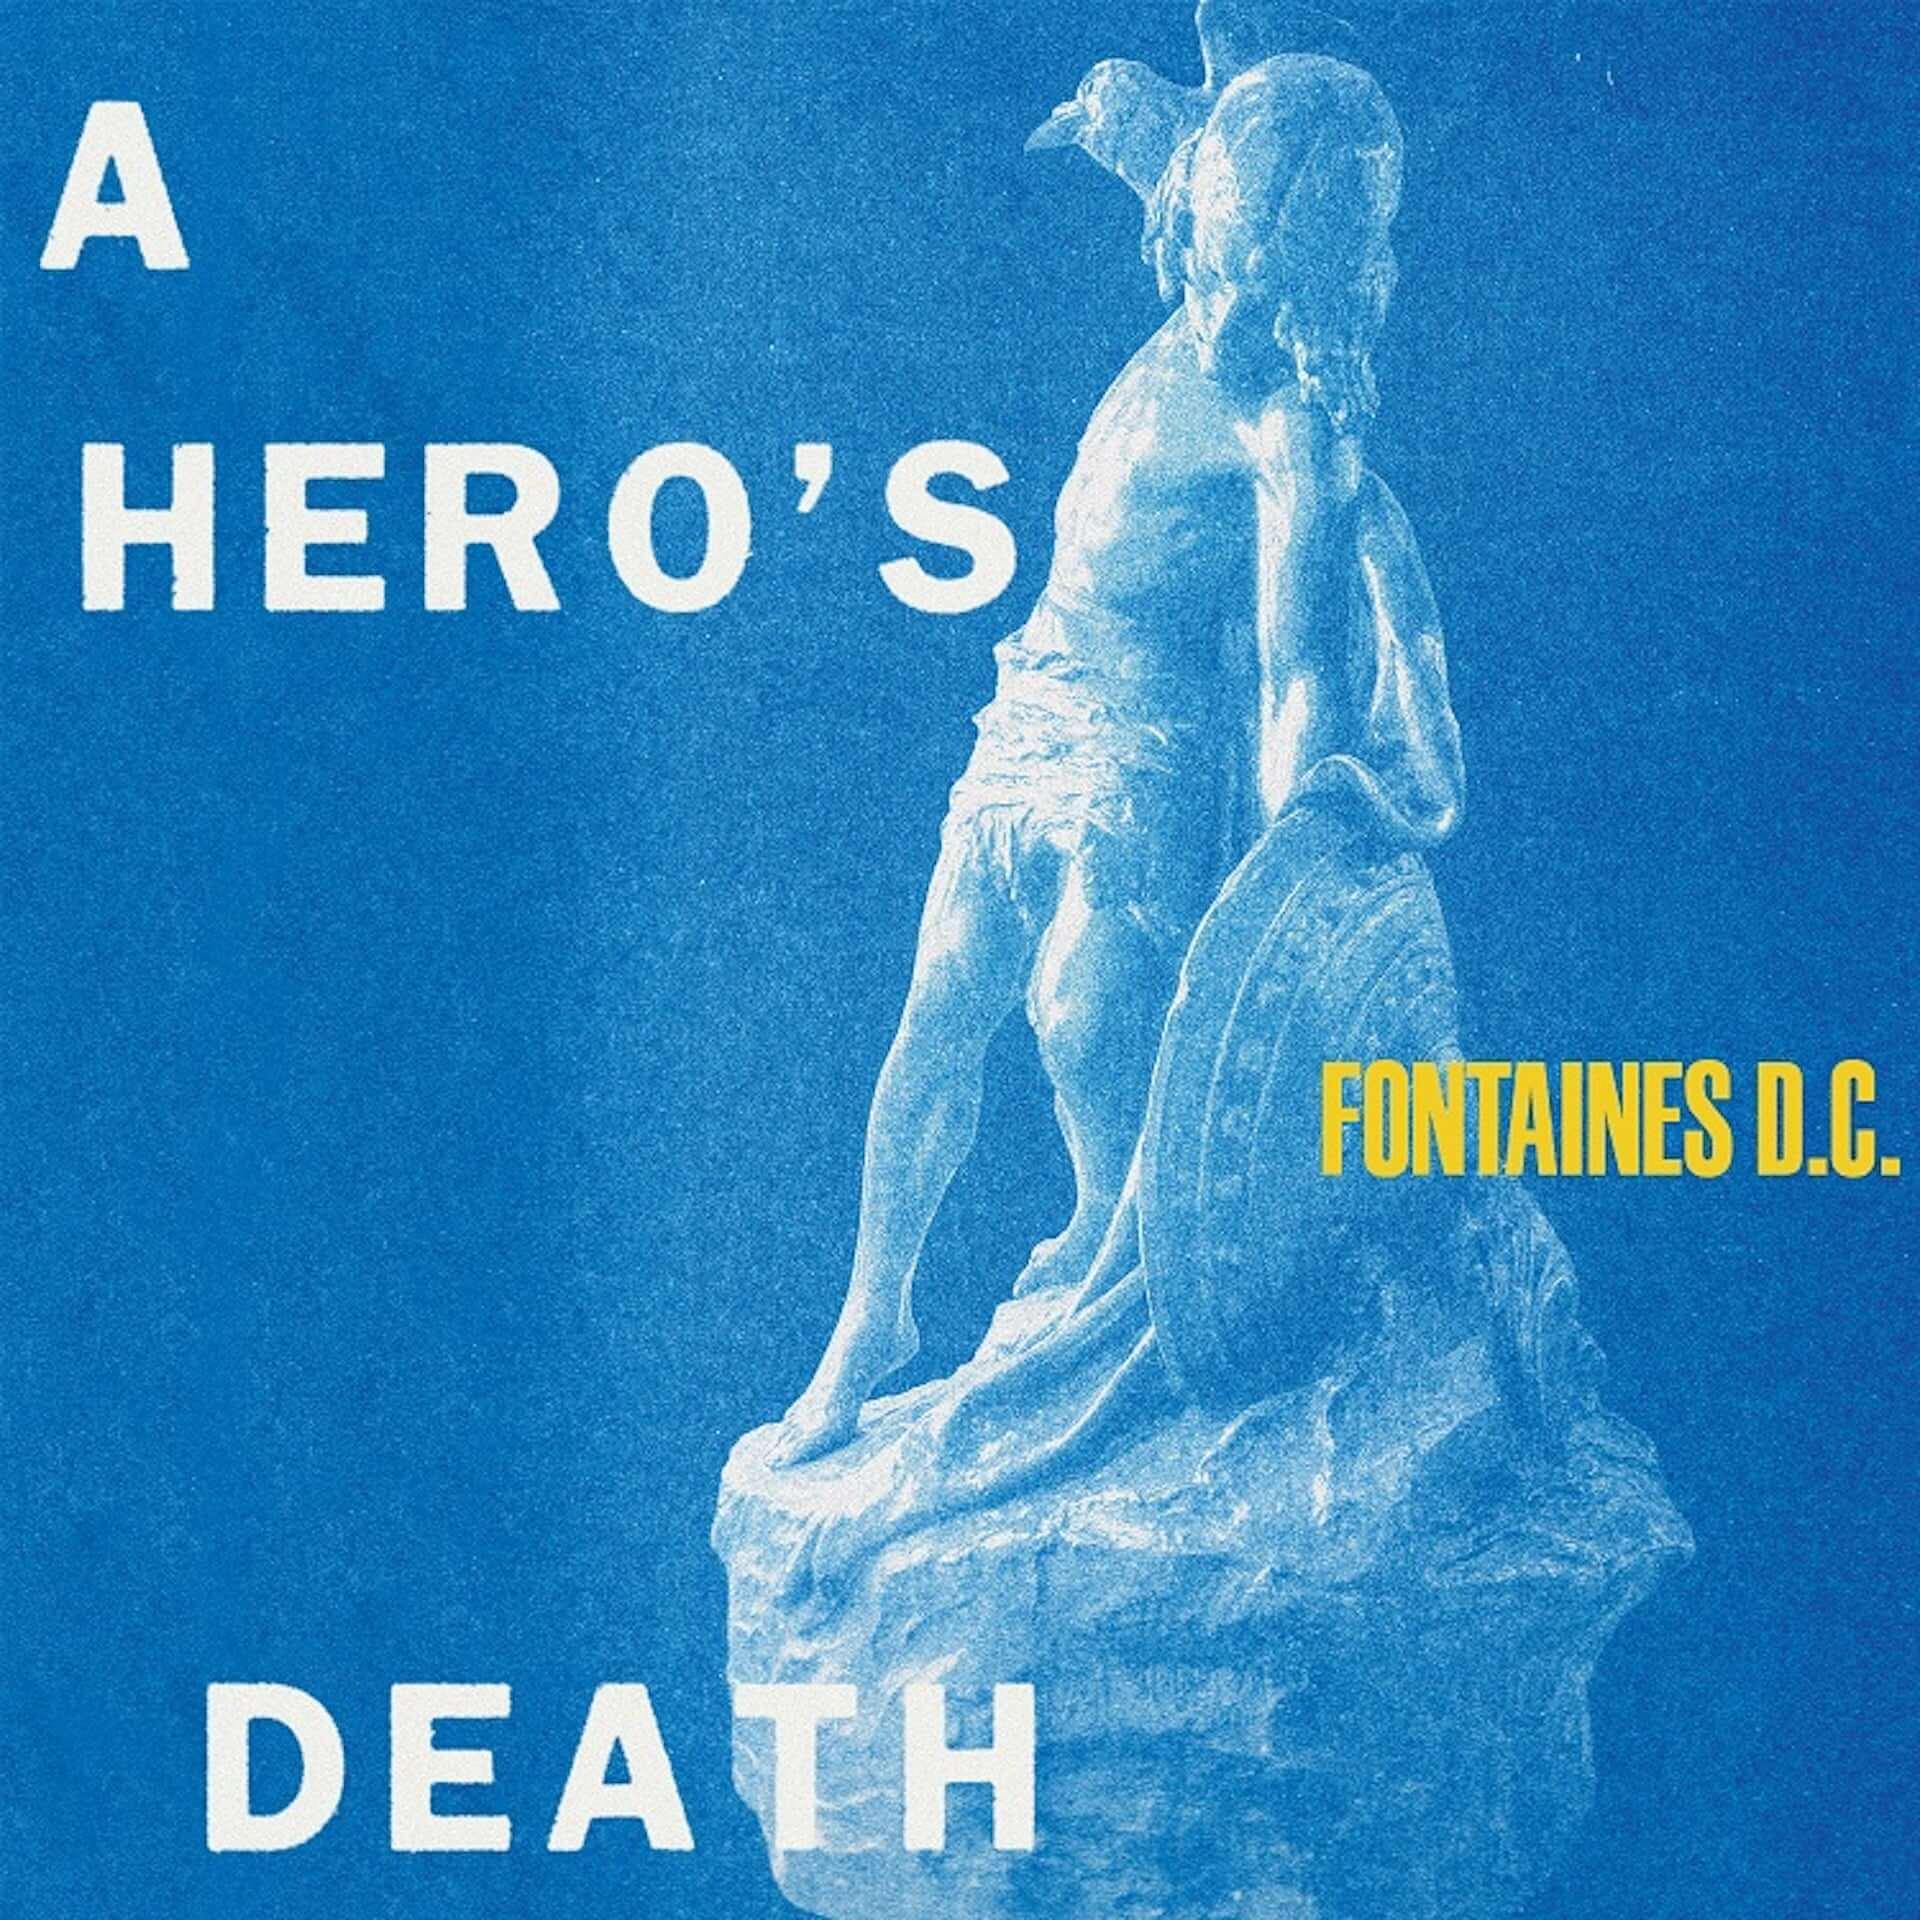 <FUJI ROCK FESTIVAL '20>にも出演するFontaines D.C.の新アルバム『A Hero's Death』がリリース決定!新曲のMVも公開 music200507_fontainesdc_1-1920x1920